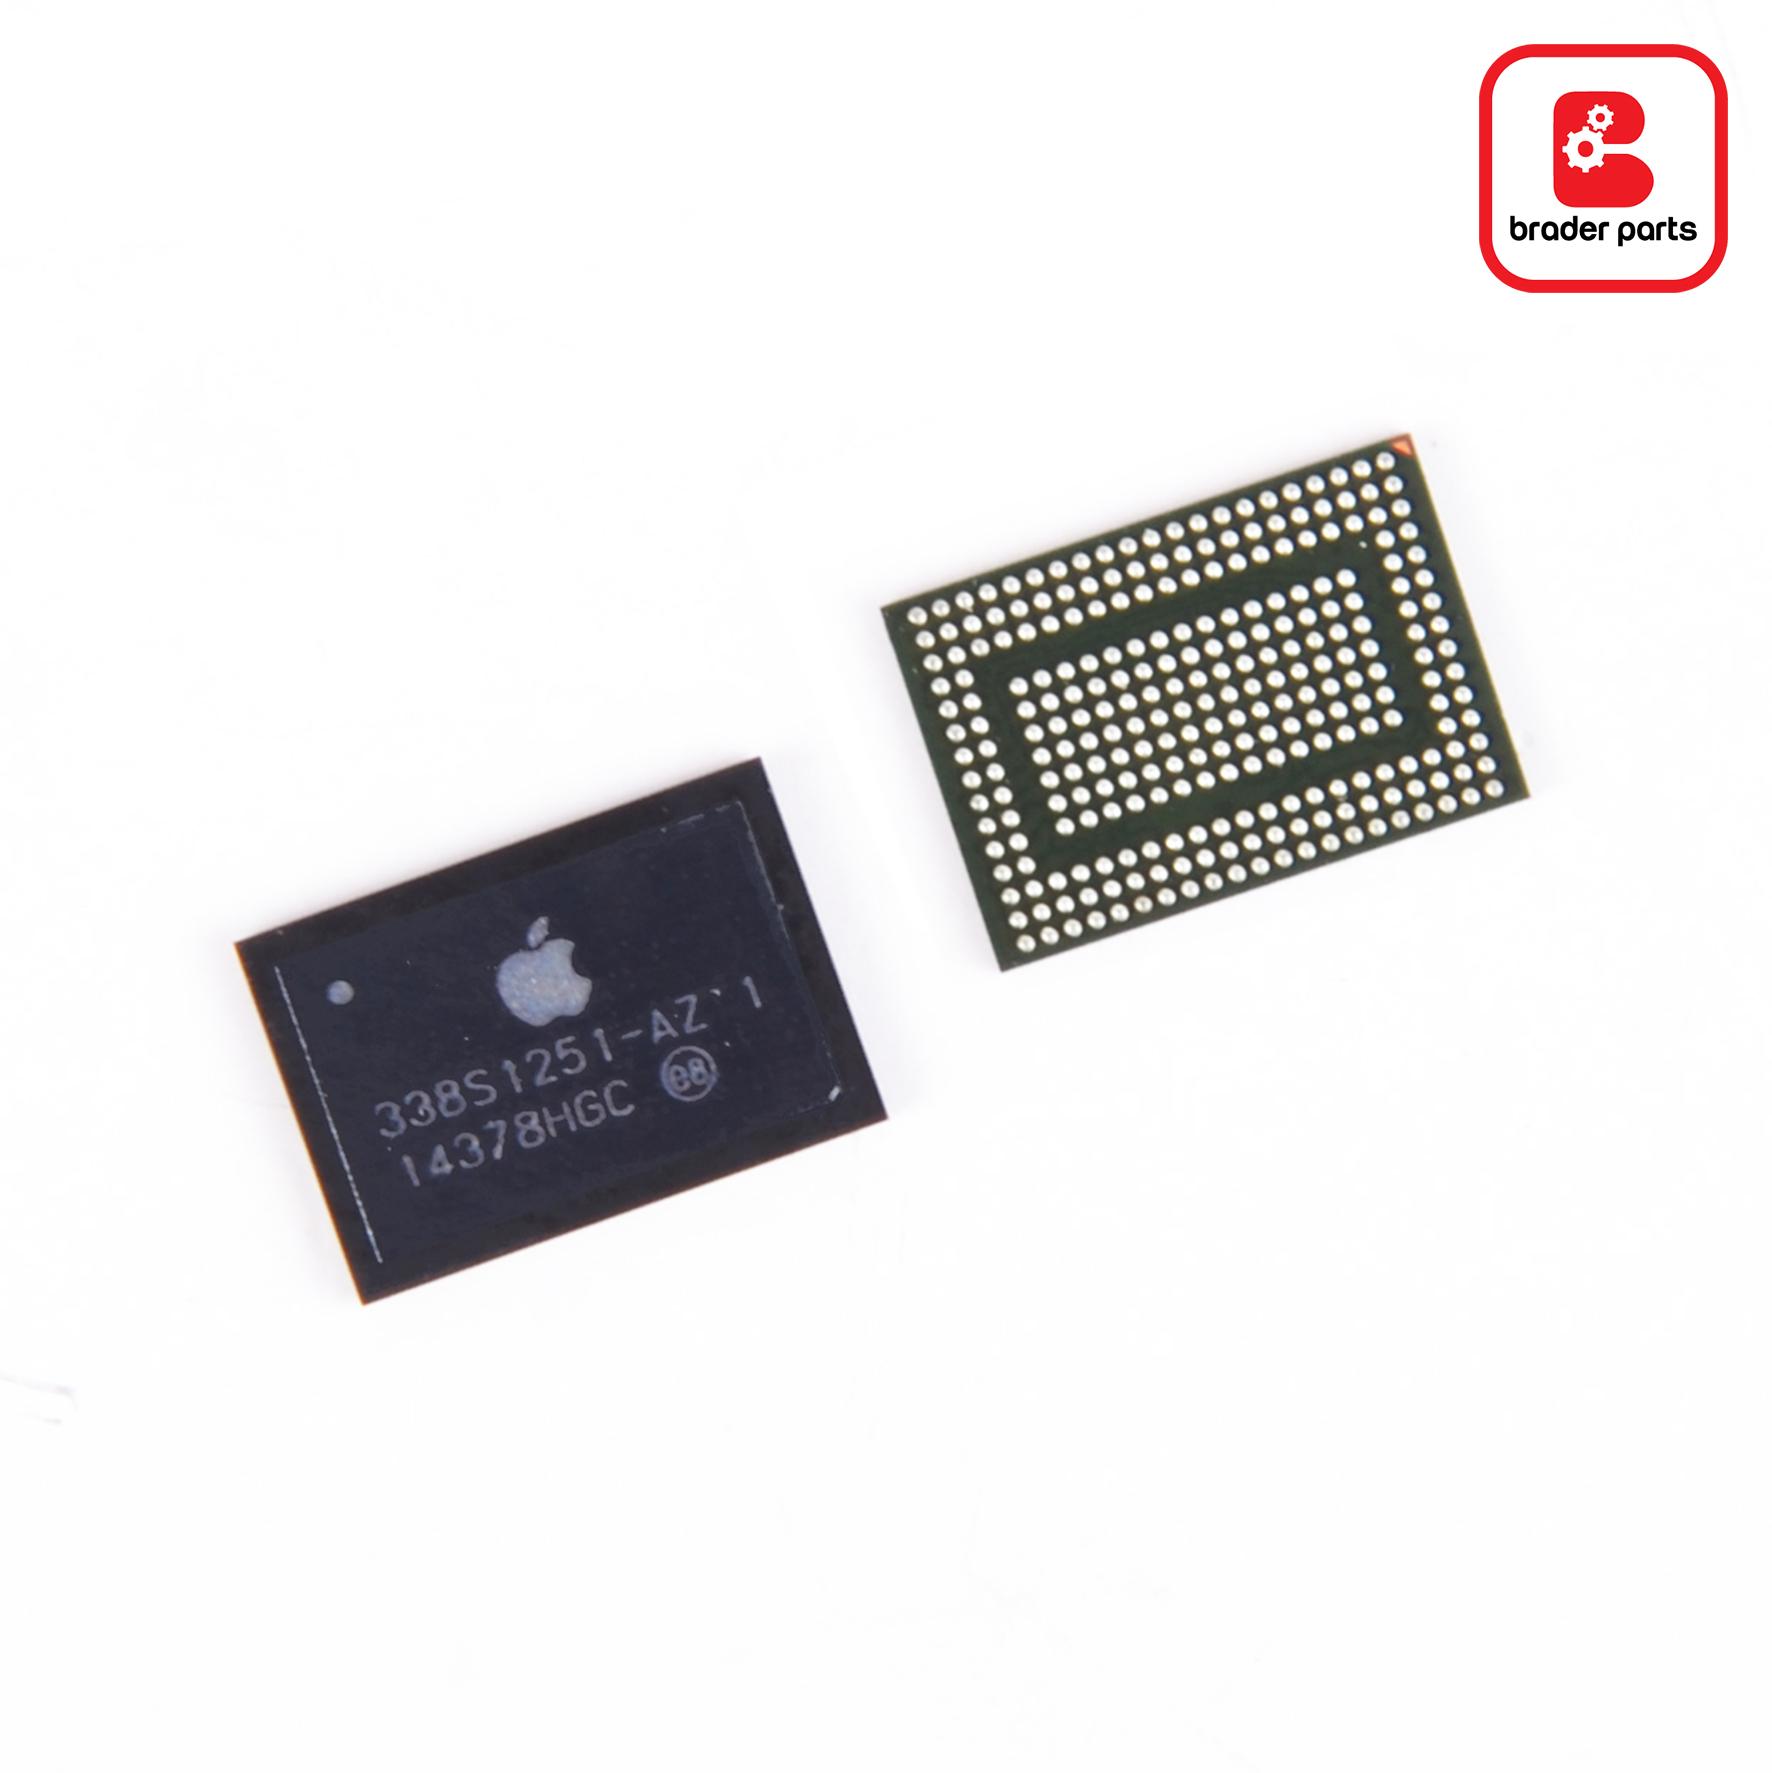 Ic Power 338S1251-AZ iPhone 6 / 6 Plus